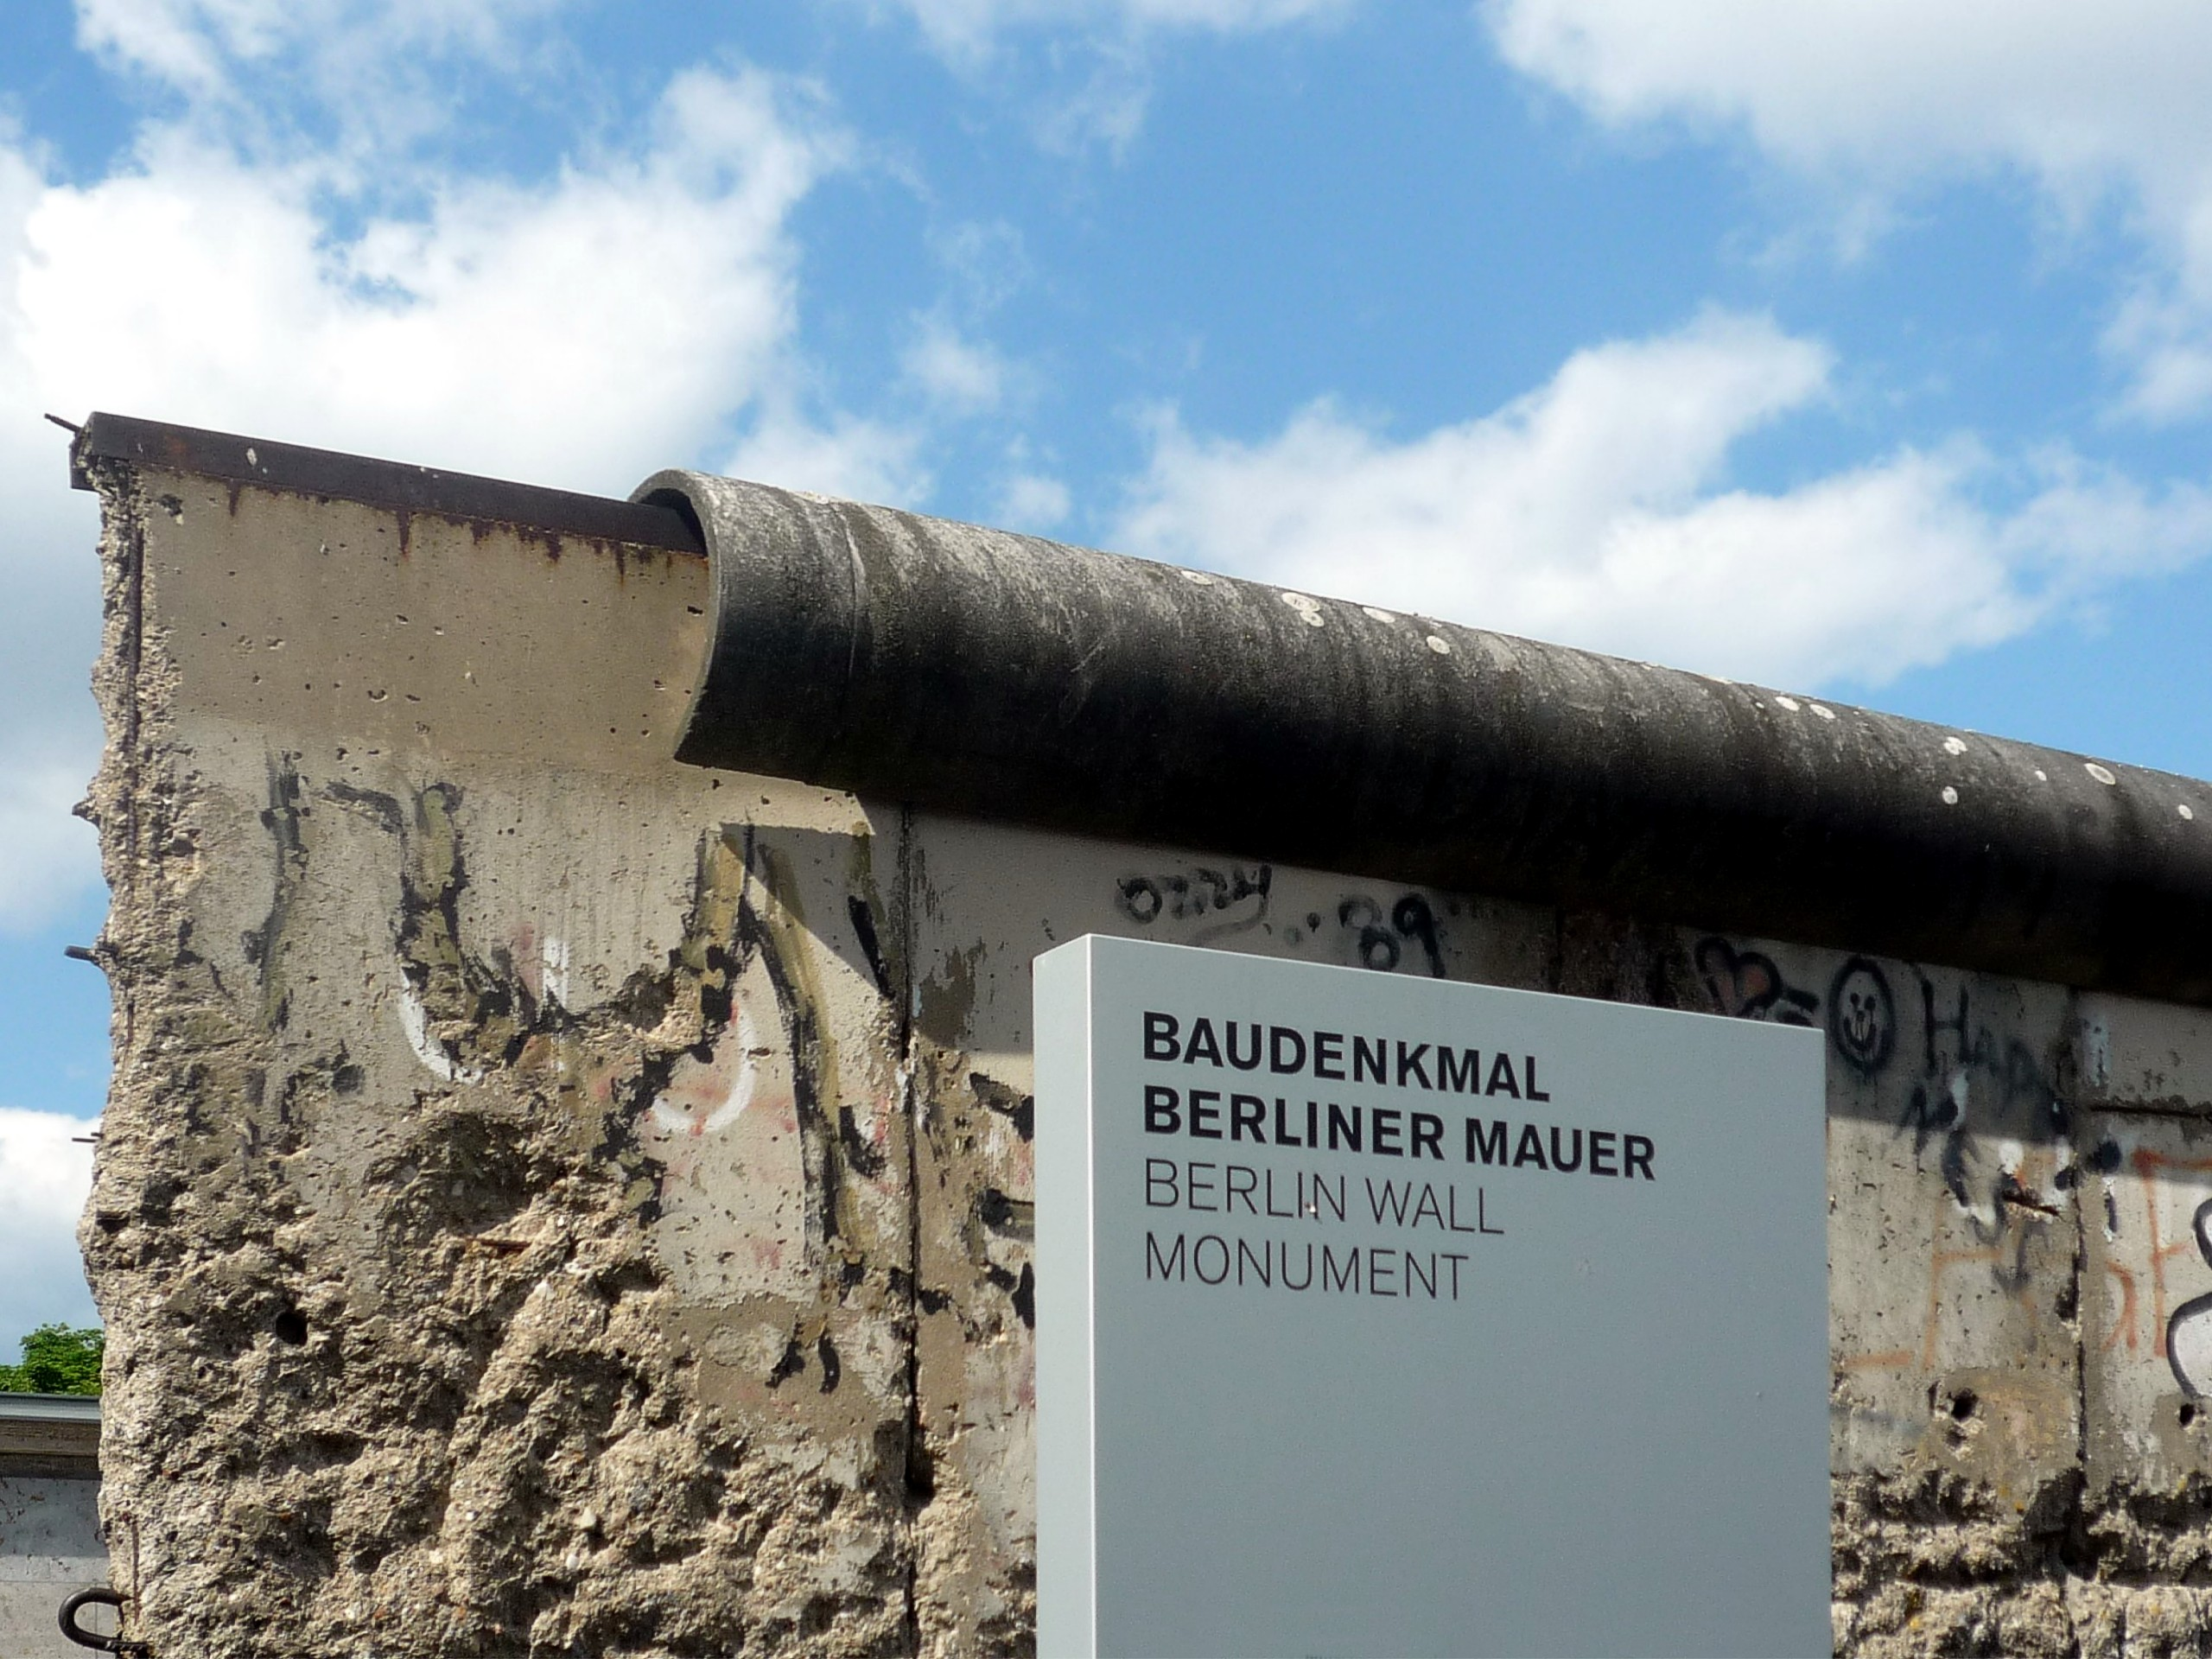 Denkmal Berliner Mauer File:berliner Mauer